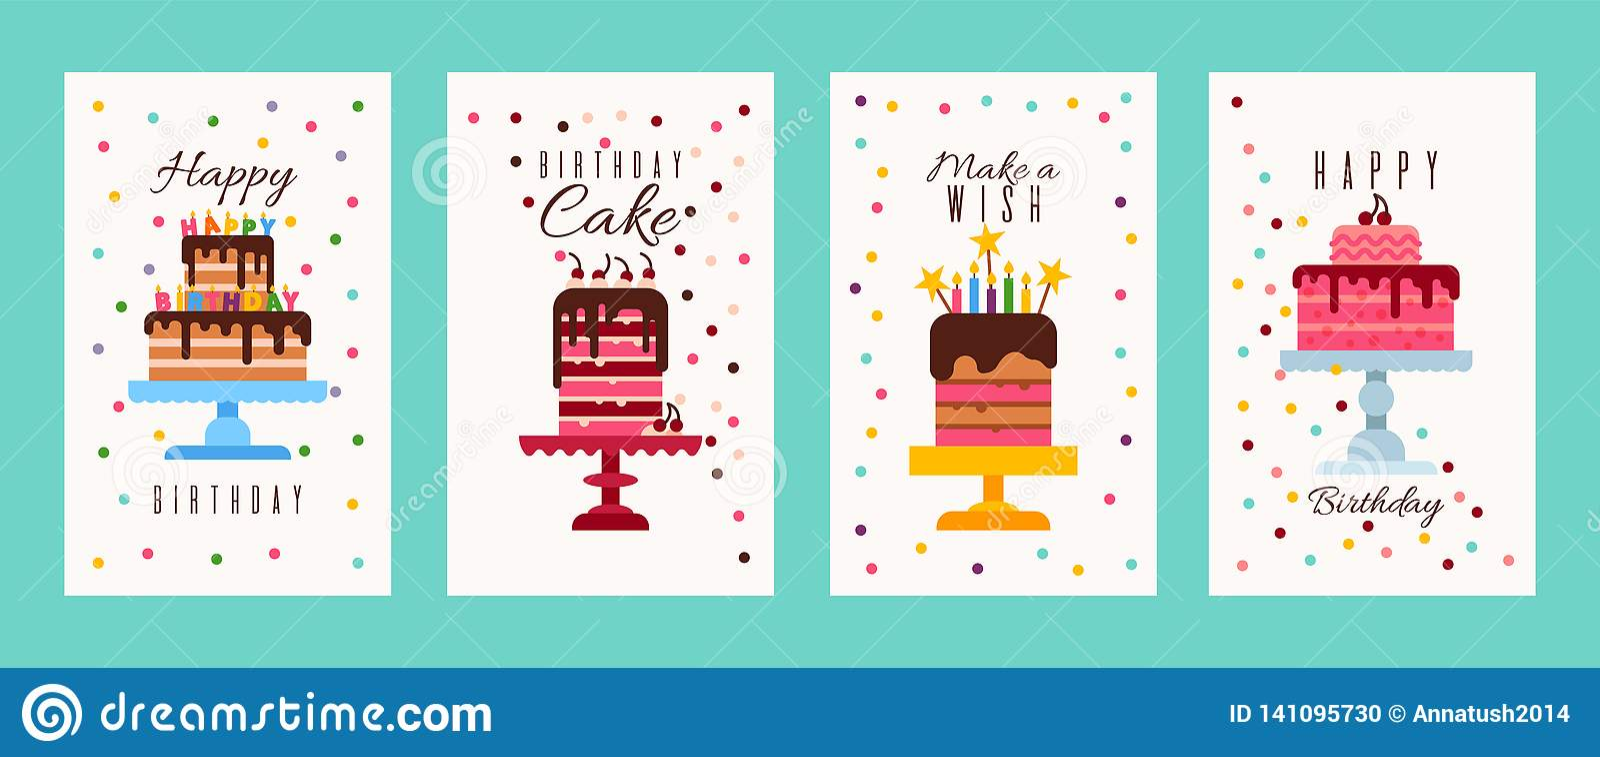 Cake Birthday Banners Or Birthday Invitation Cards Vector